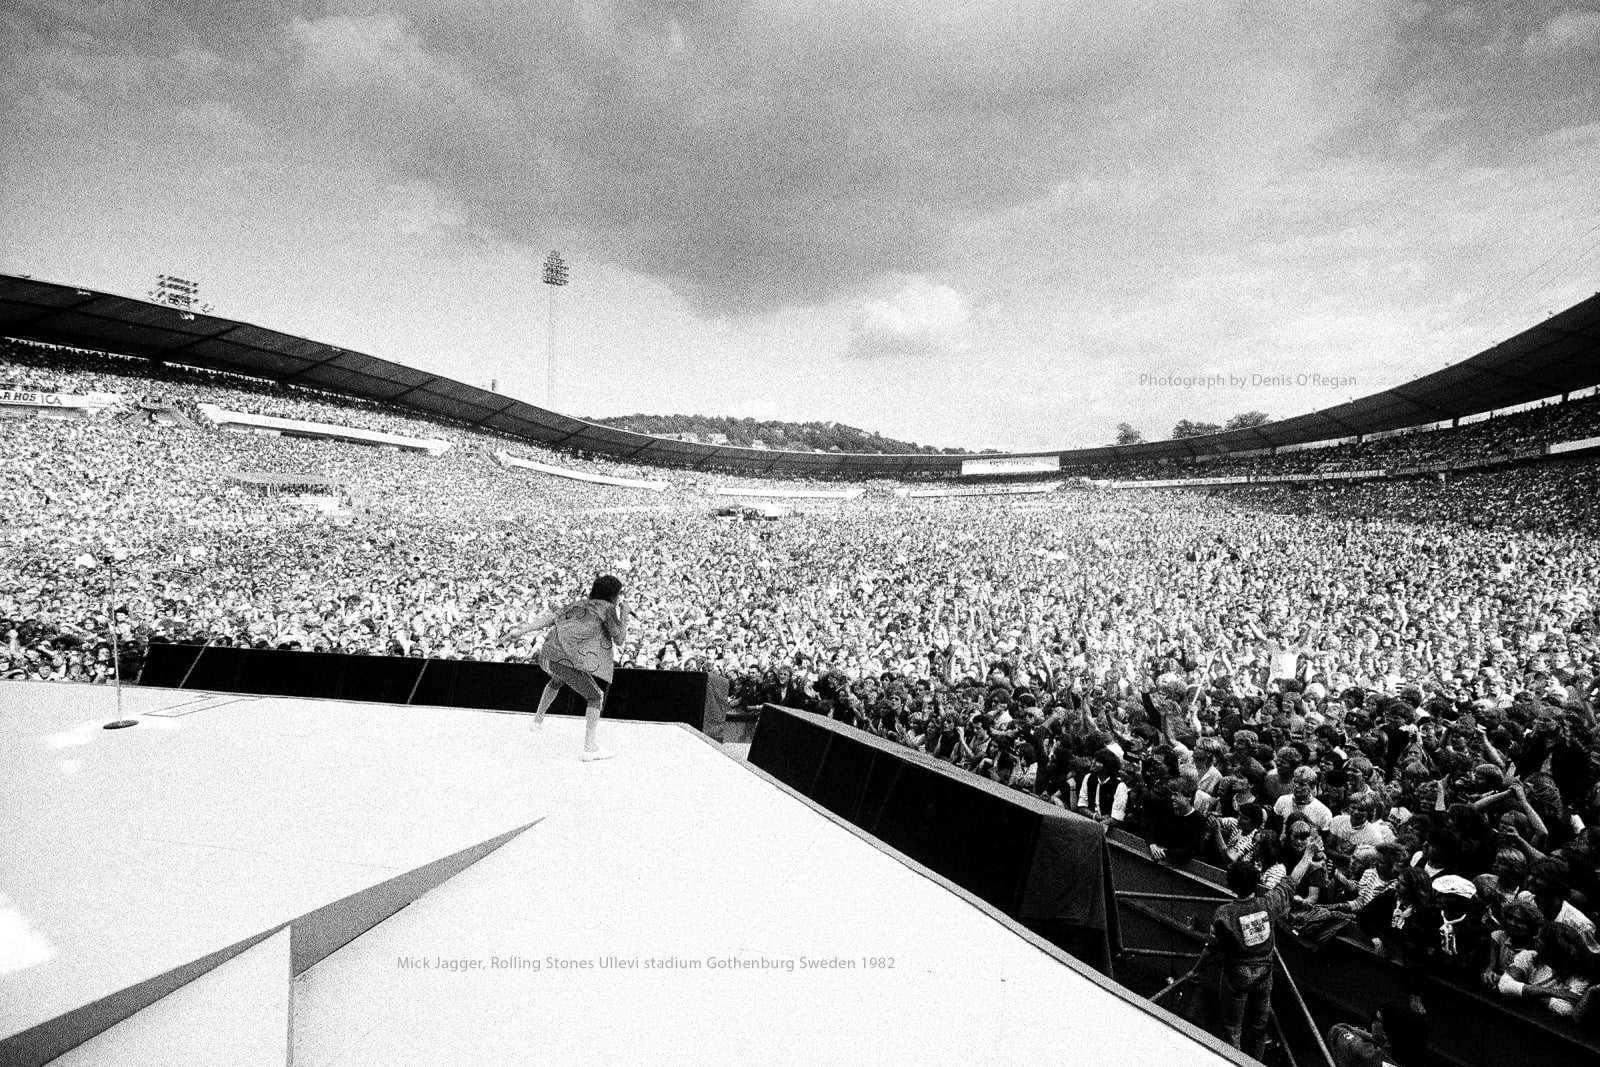 ROLLING STONES, Mick Jagger Gothenburg, 1982